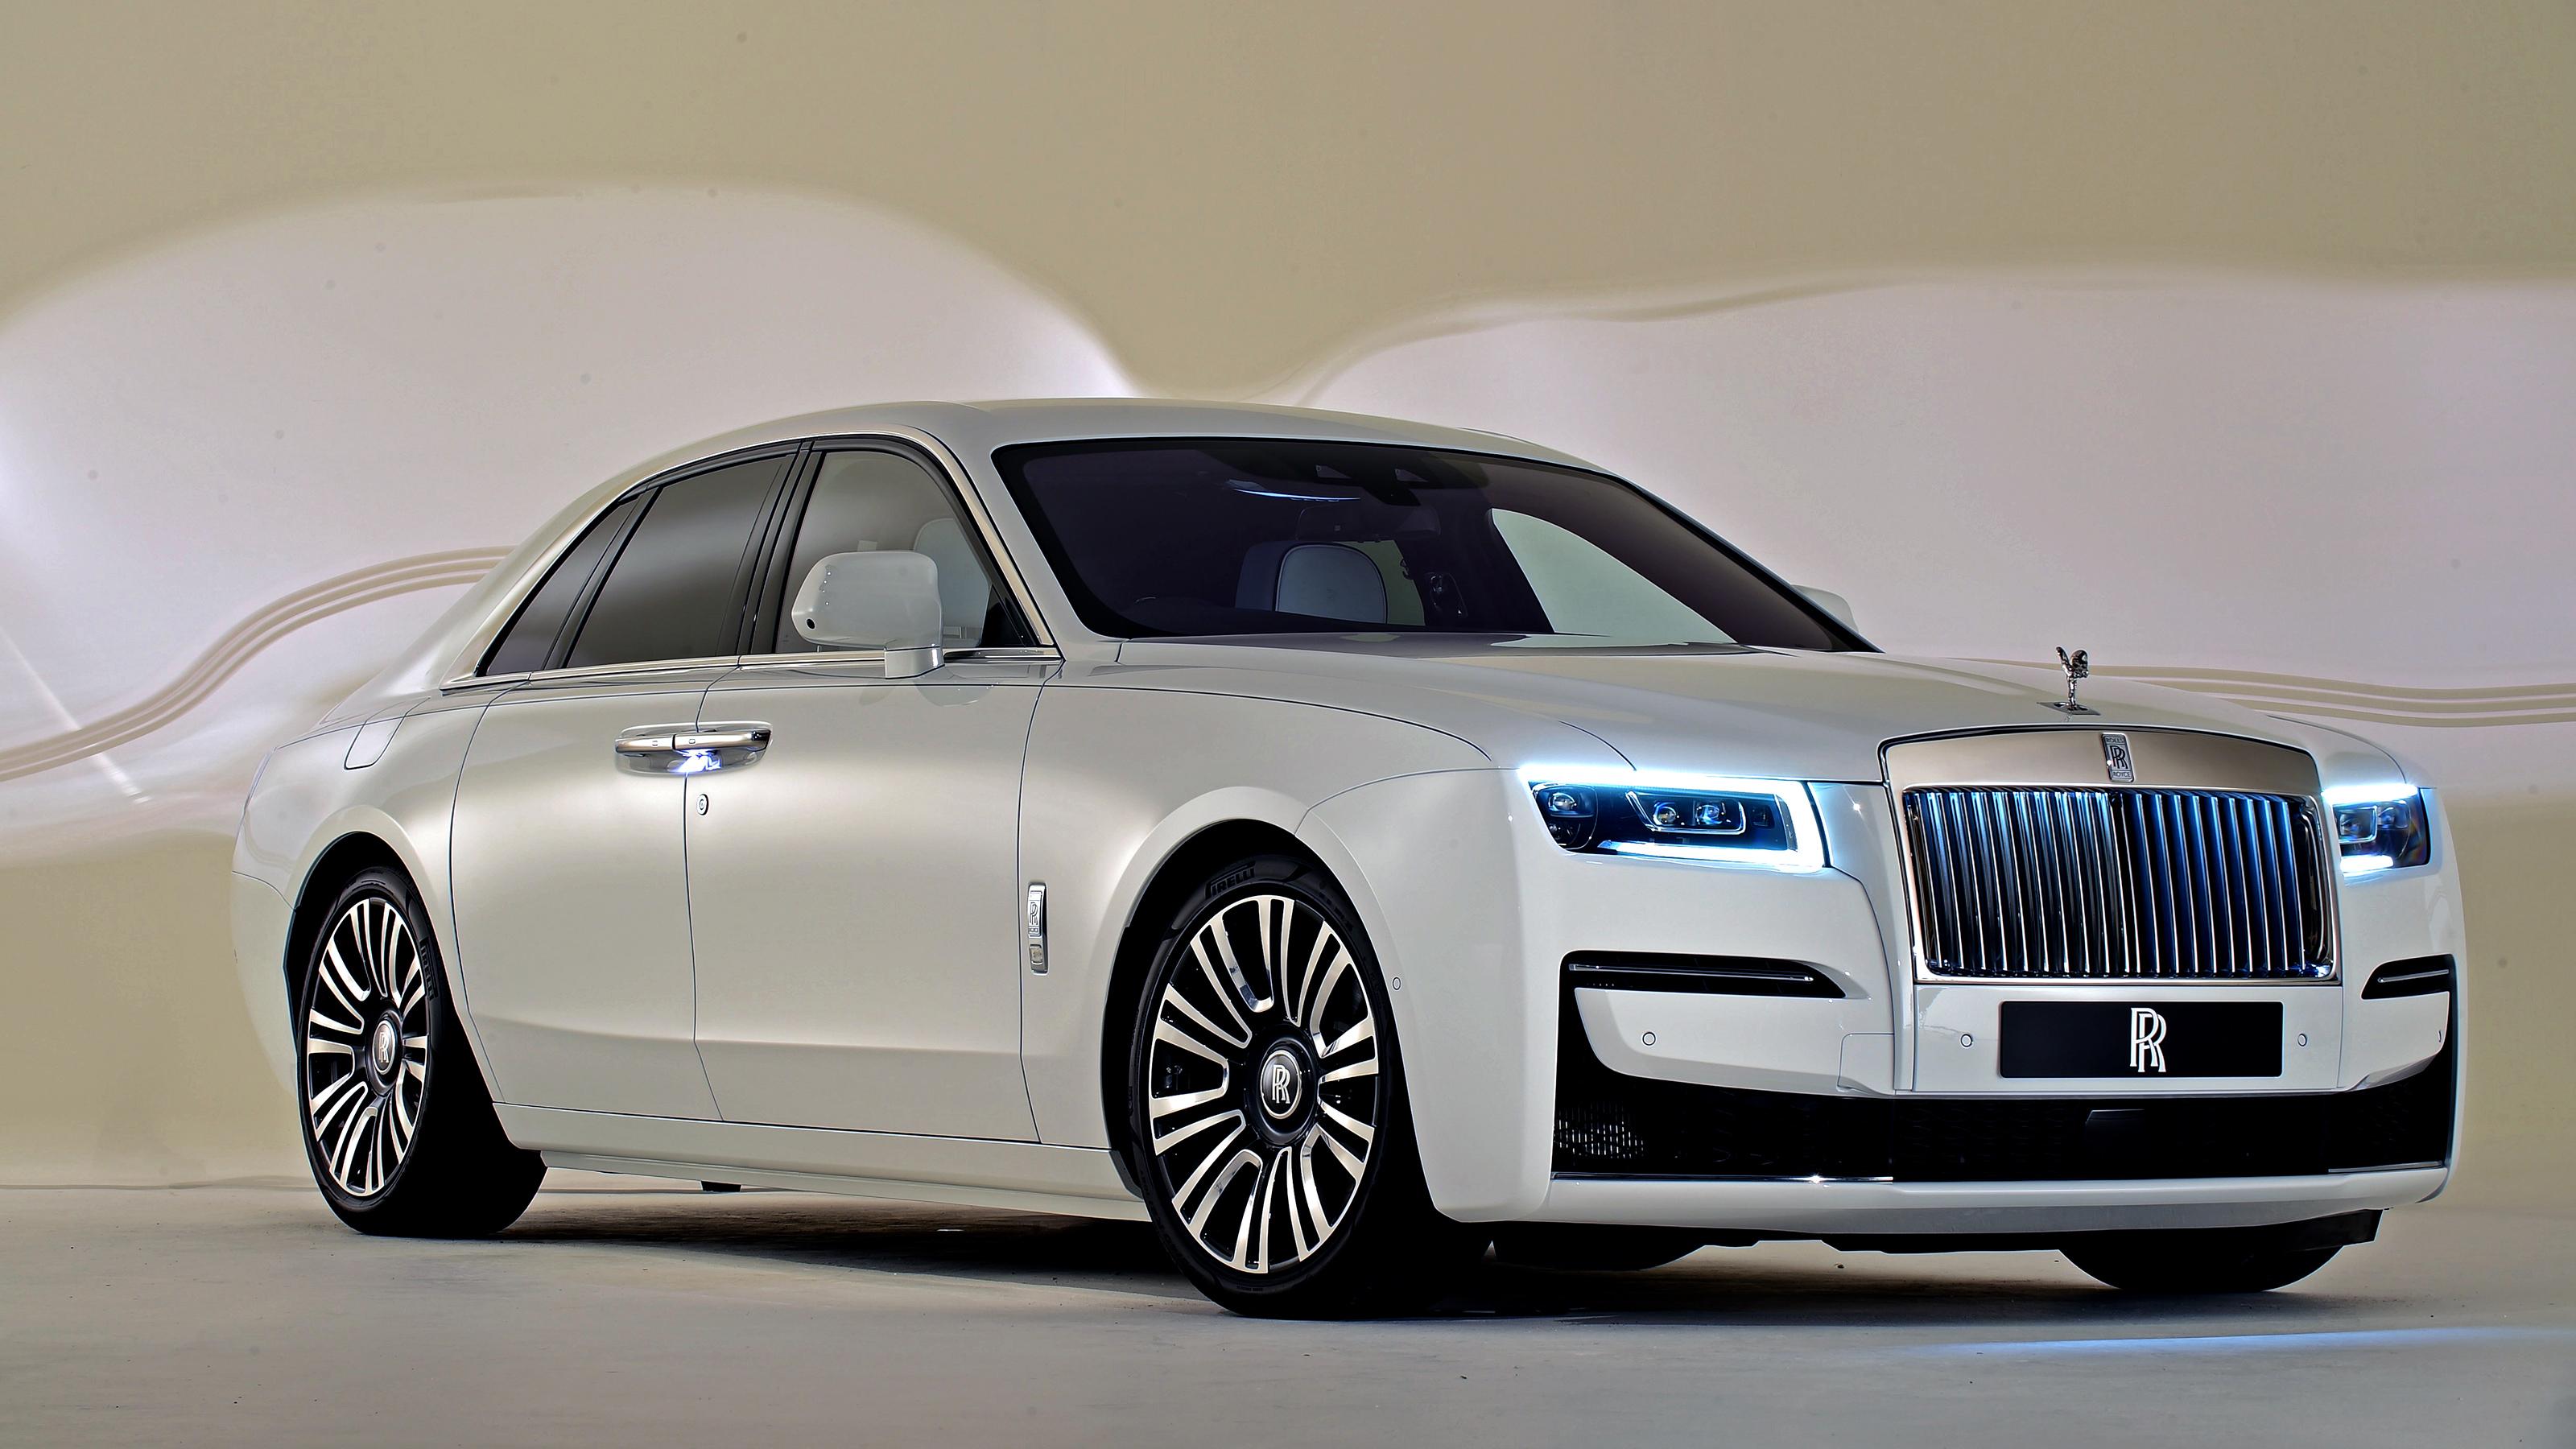 New Rolls-Royce Ghost luxury saloon wafts in   Auto Express